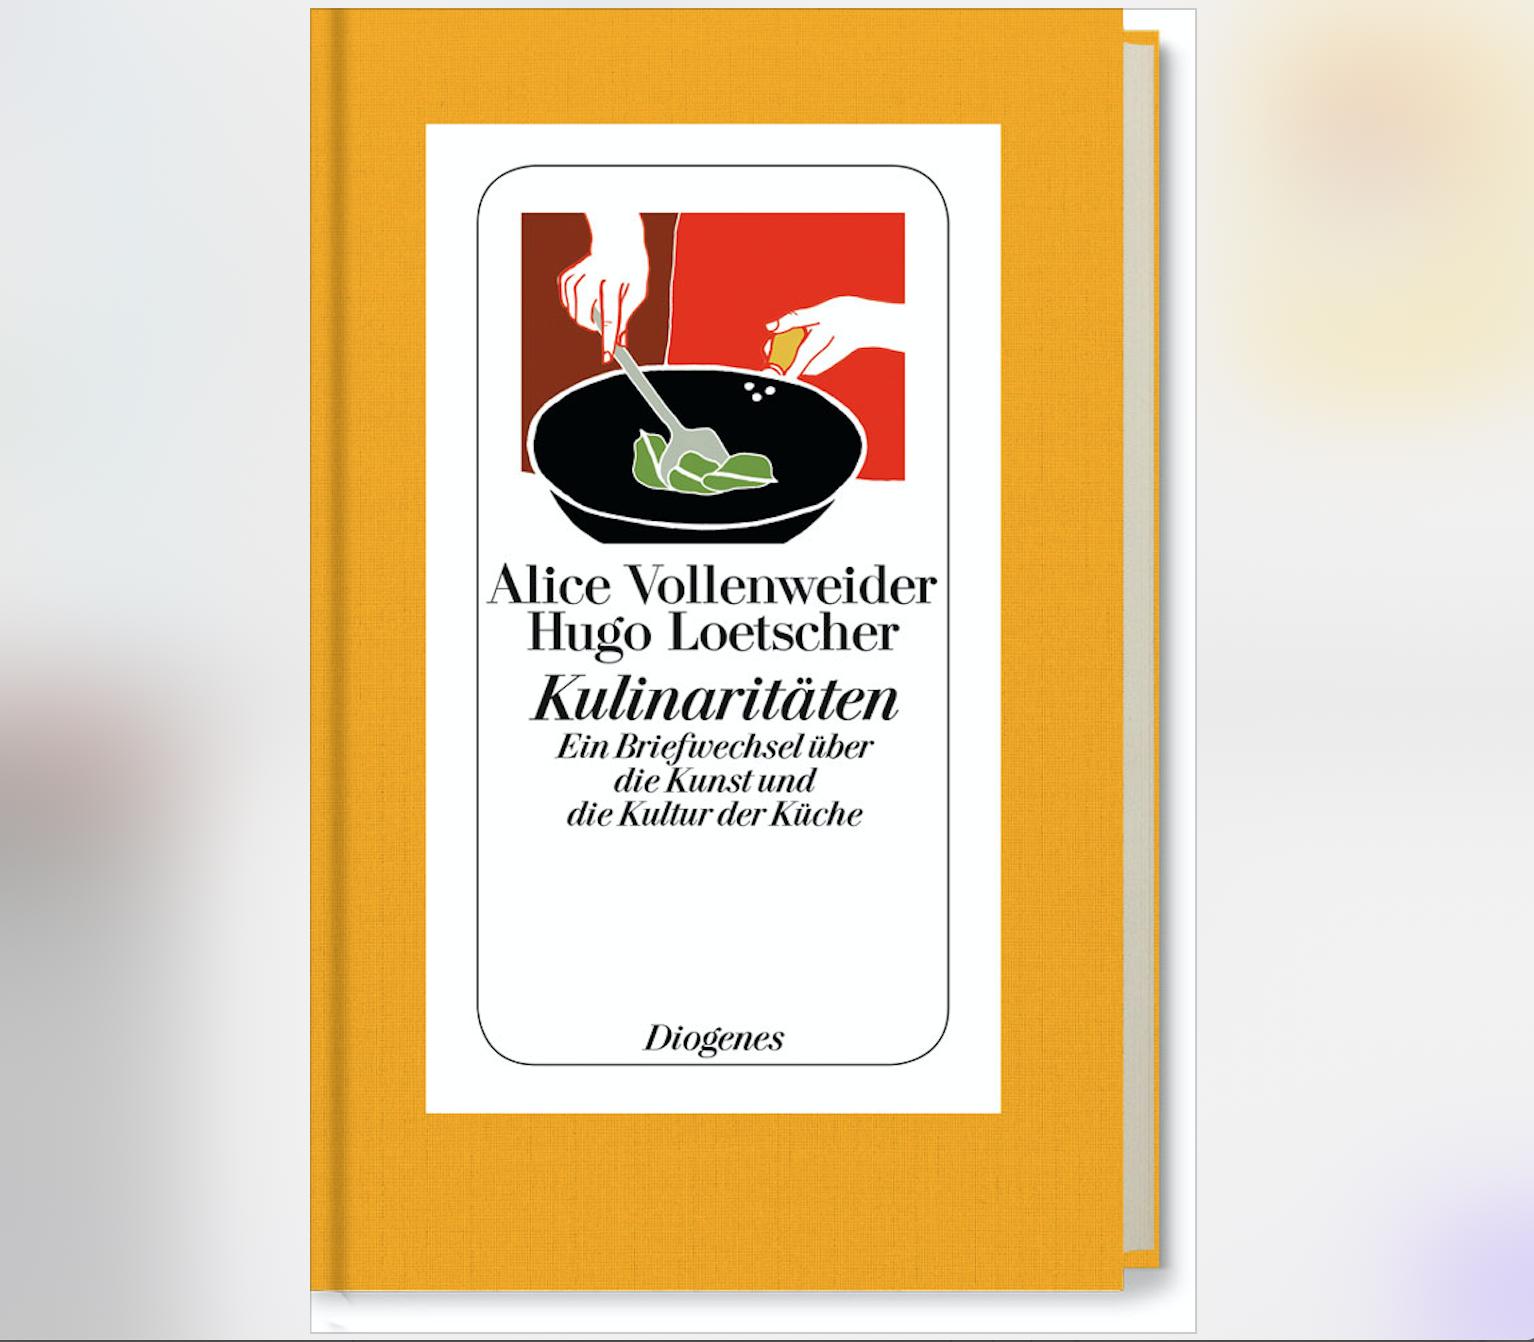 A. Vollenweider u. Hugo Loetscher X Kulinaritäten